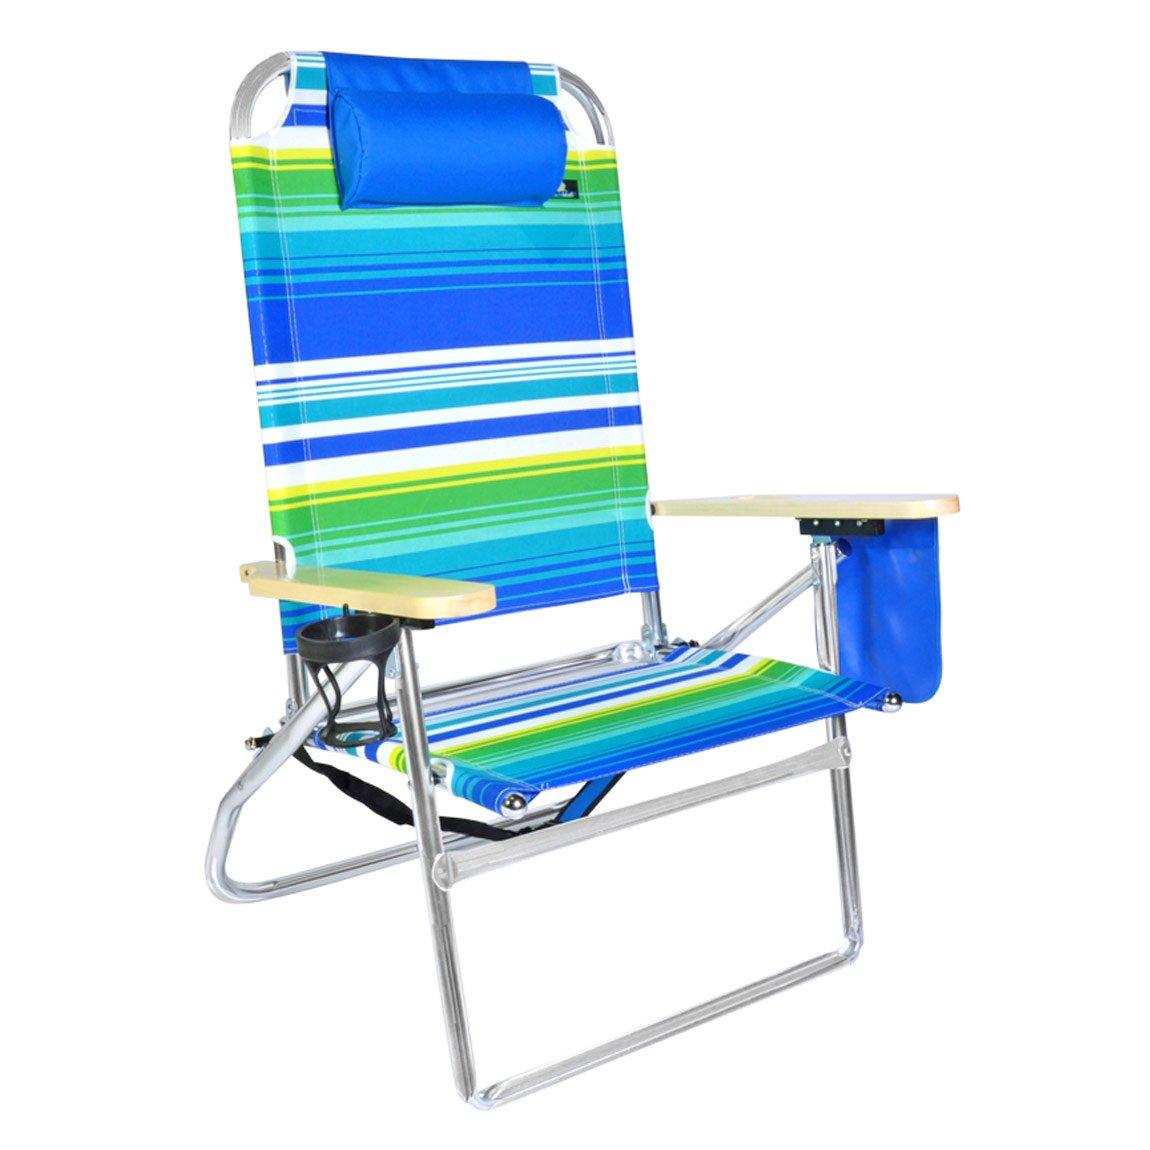 Extra Large – 高Seat Heavy Duty 4位置ビーチ椅子W /ドリンクホルダー B079K8FFWN 851 851